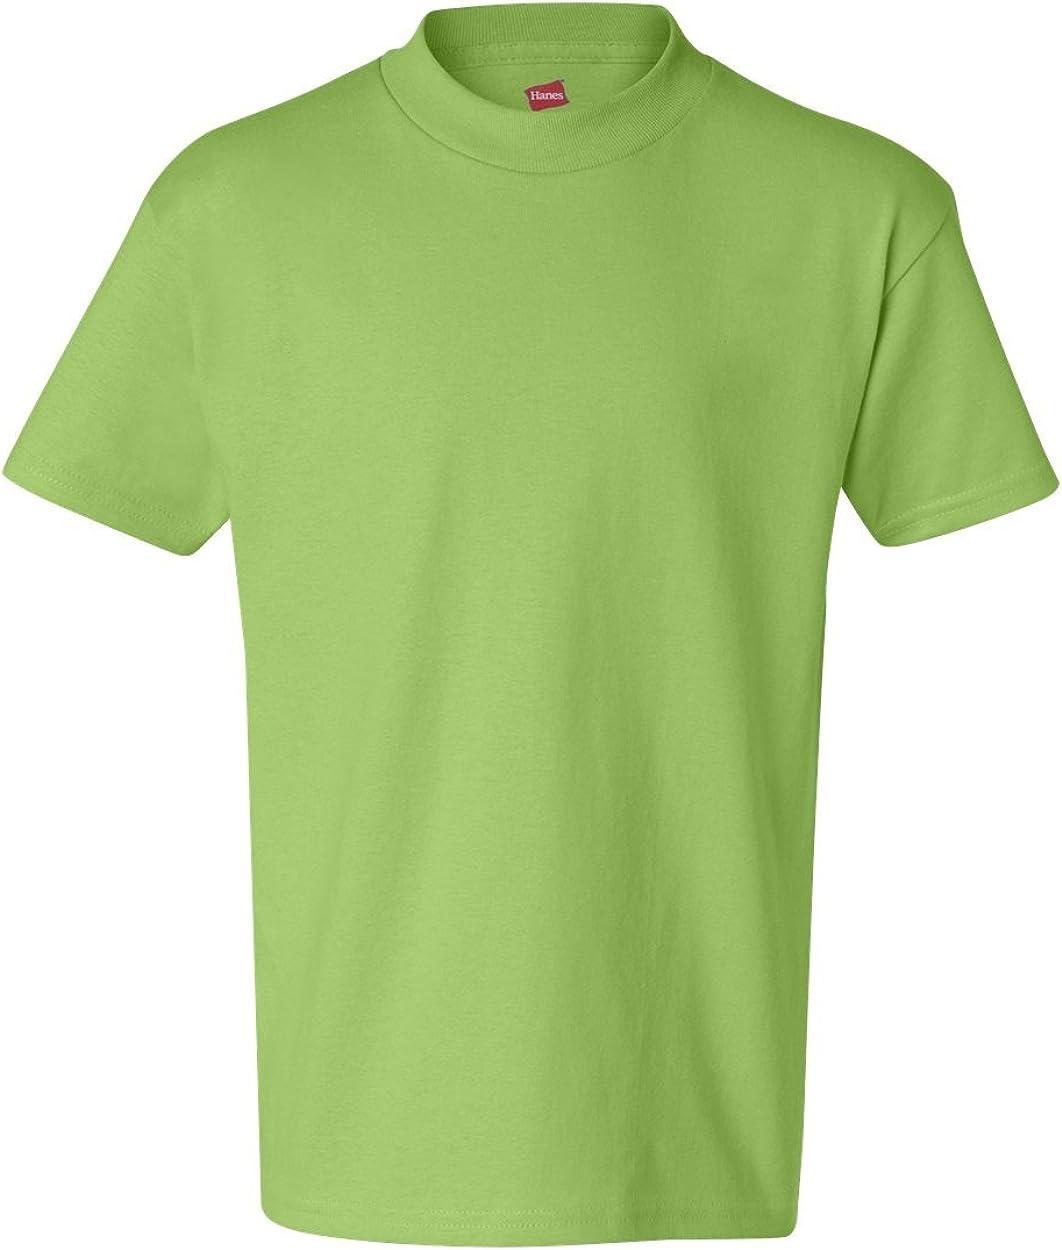 Hanes - Tagless Youth T-Shirt - 5450: Clothing